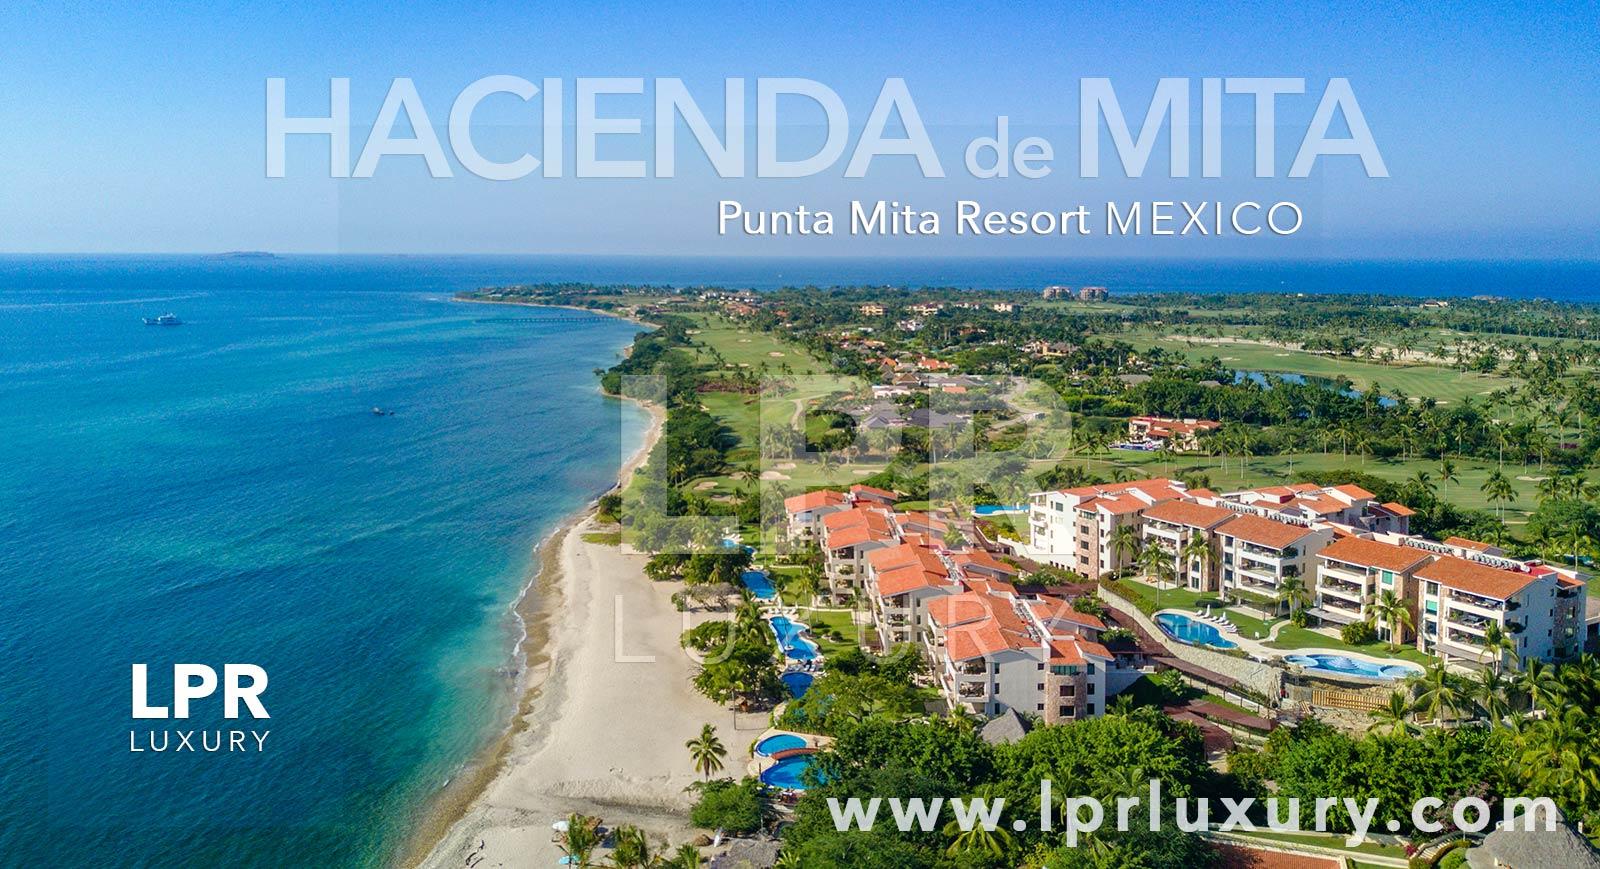 Hacienda de Mita - Luxury Beachfront Punta Mita Resort Condominiums - Four Seasons / St. Regis Punta Mita Resort